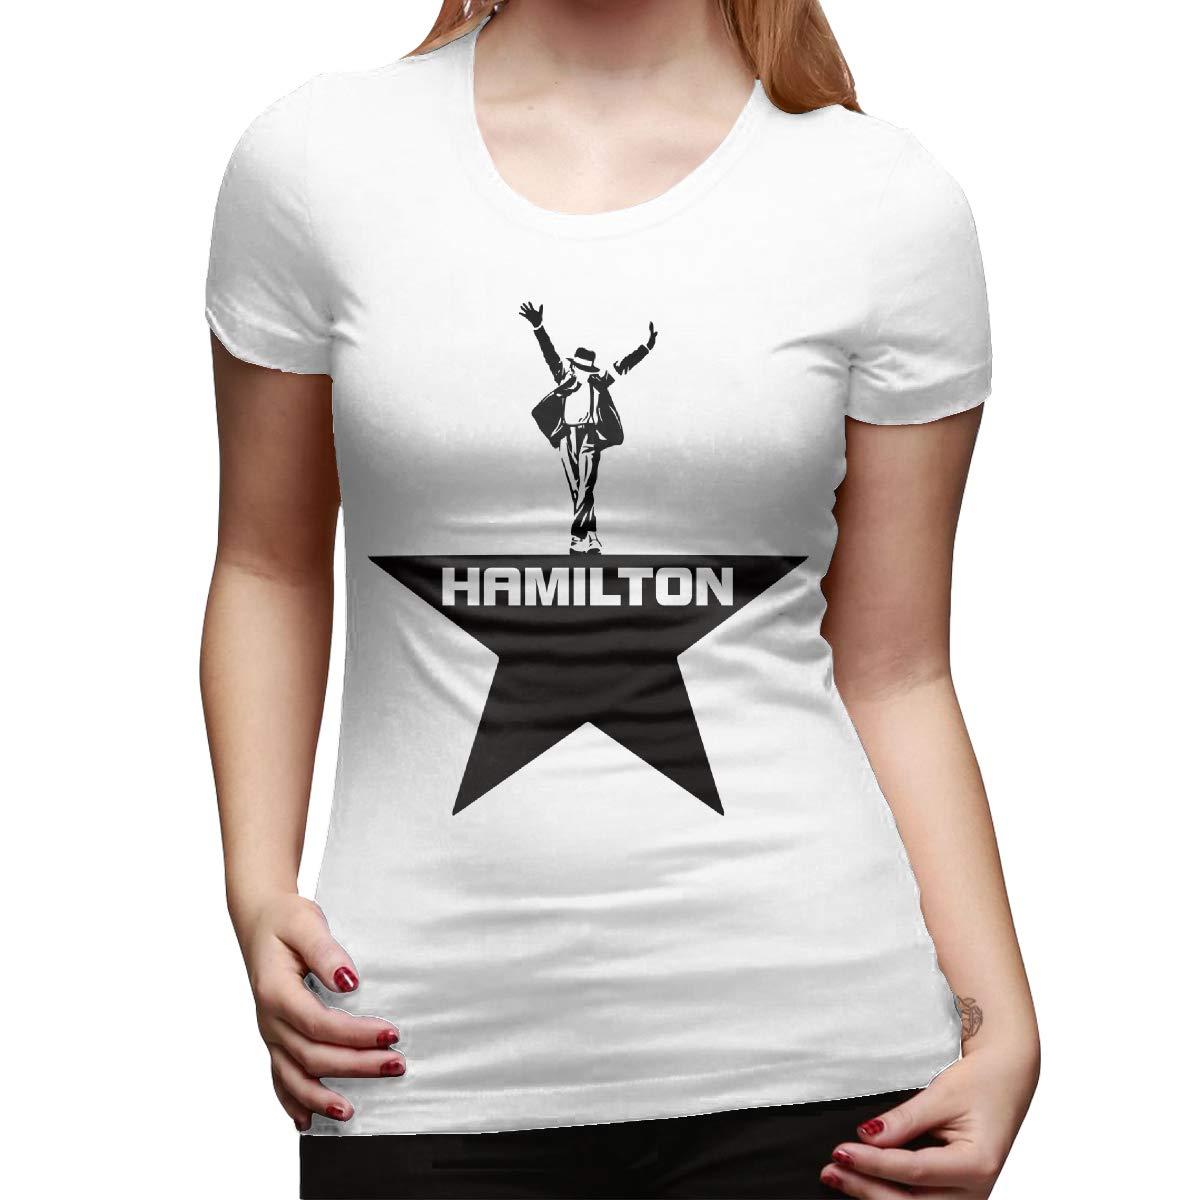 Martina Houston Musicals Hamilton Short Sleeve Tee Tshirts